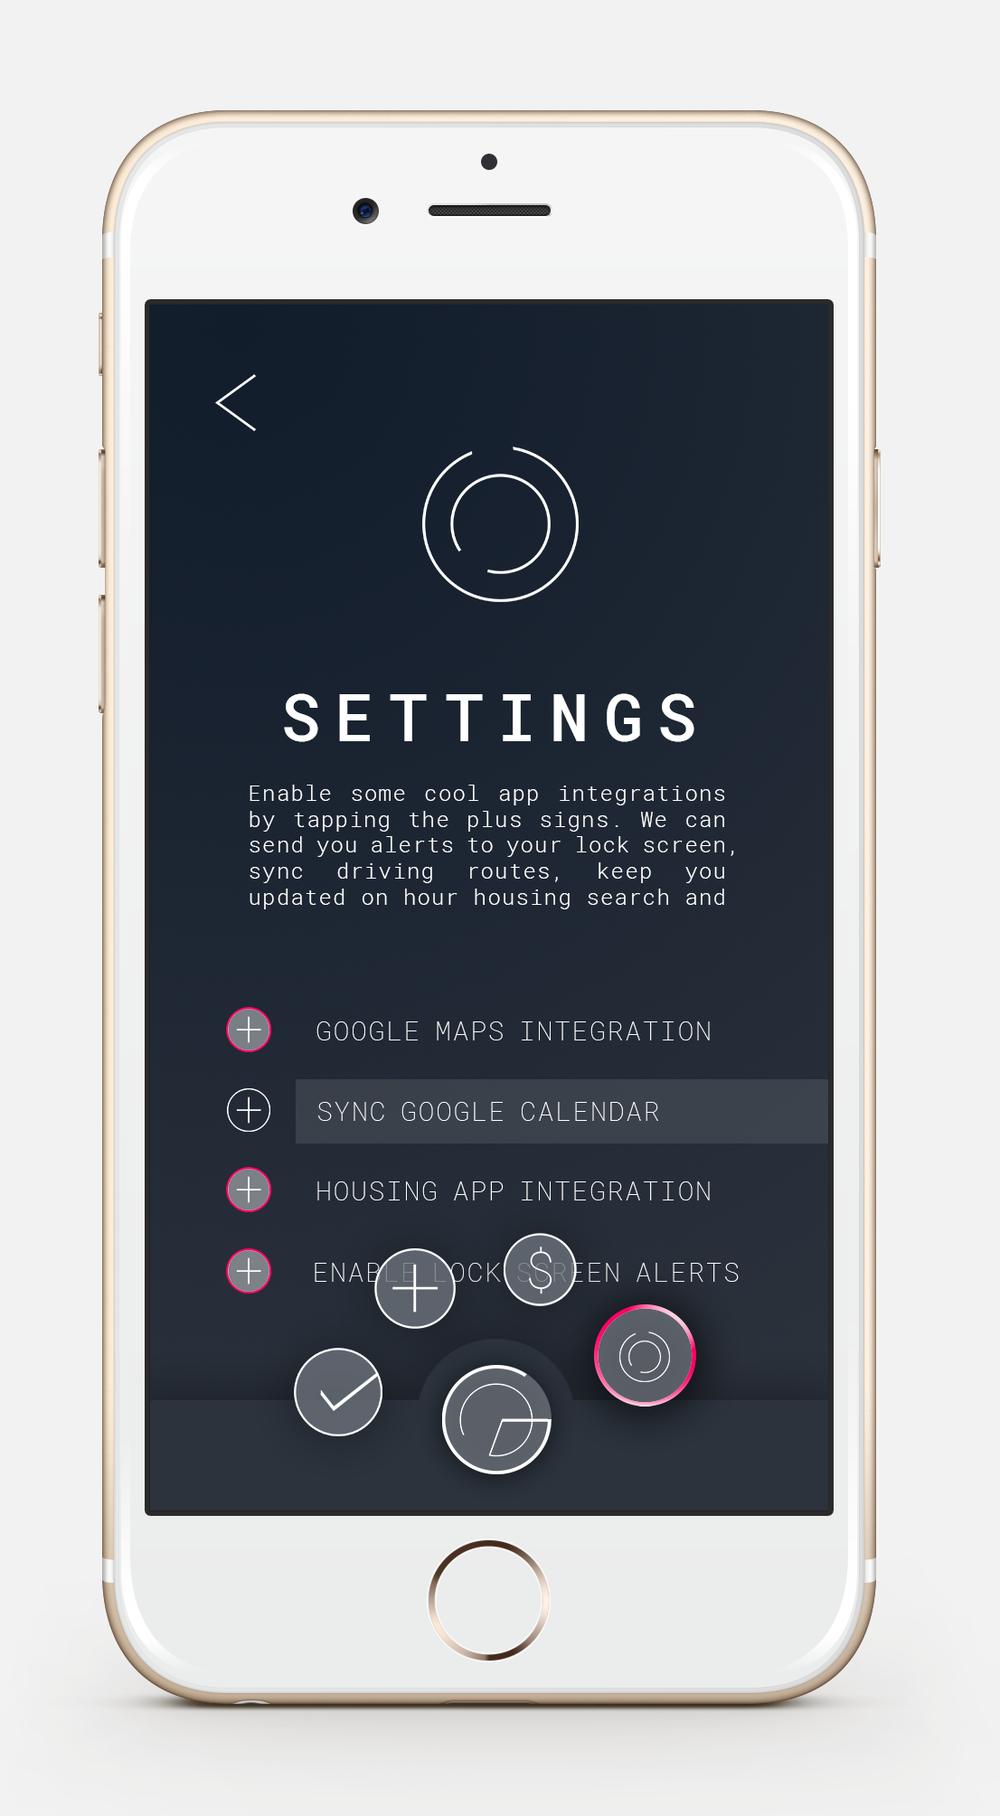 agile-settings-nav-active.png